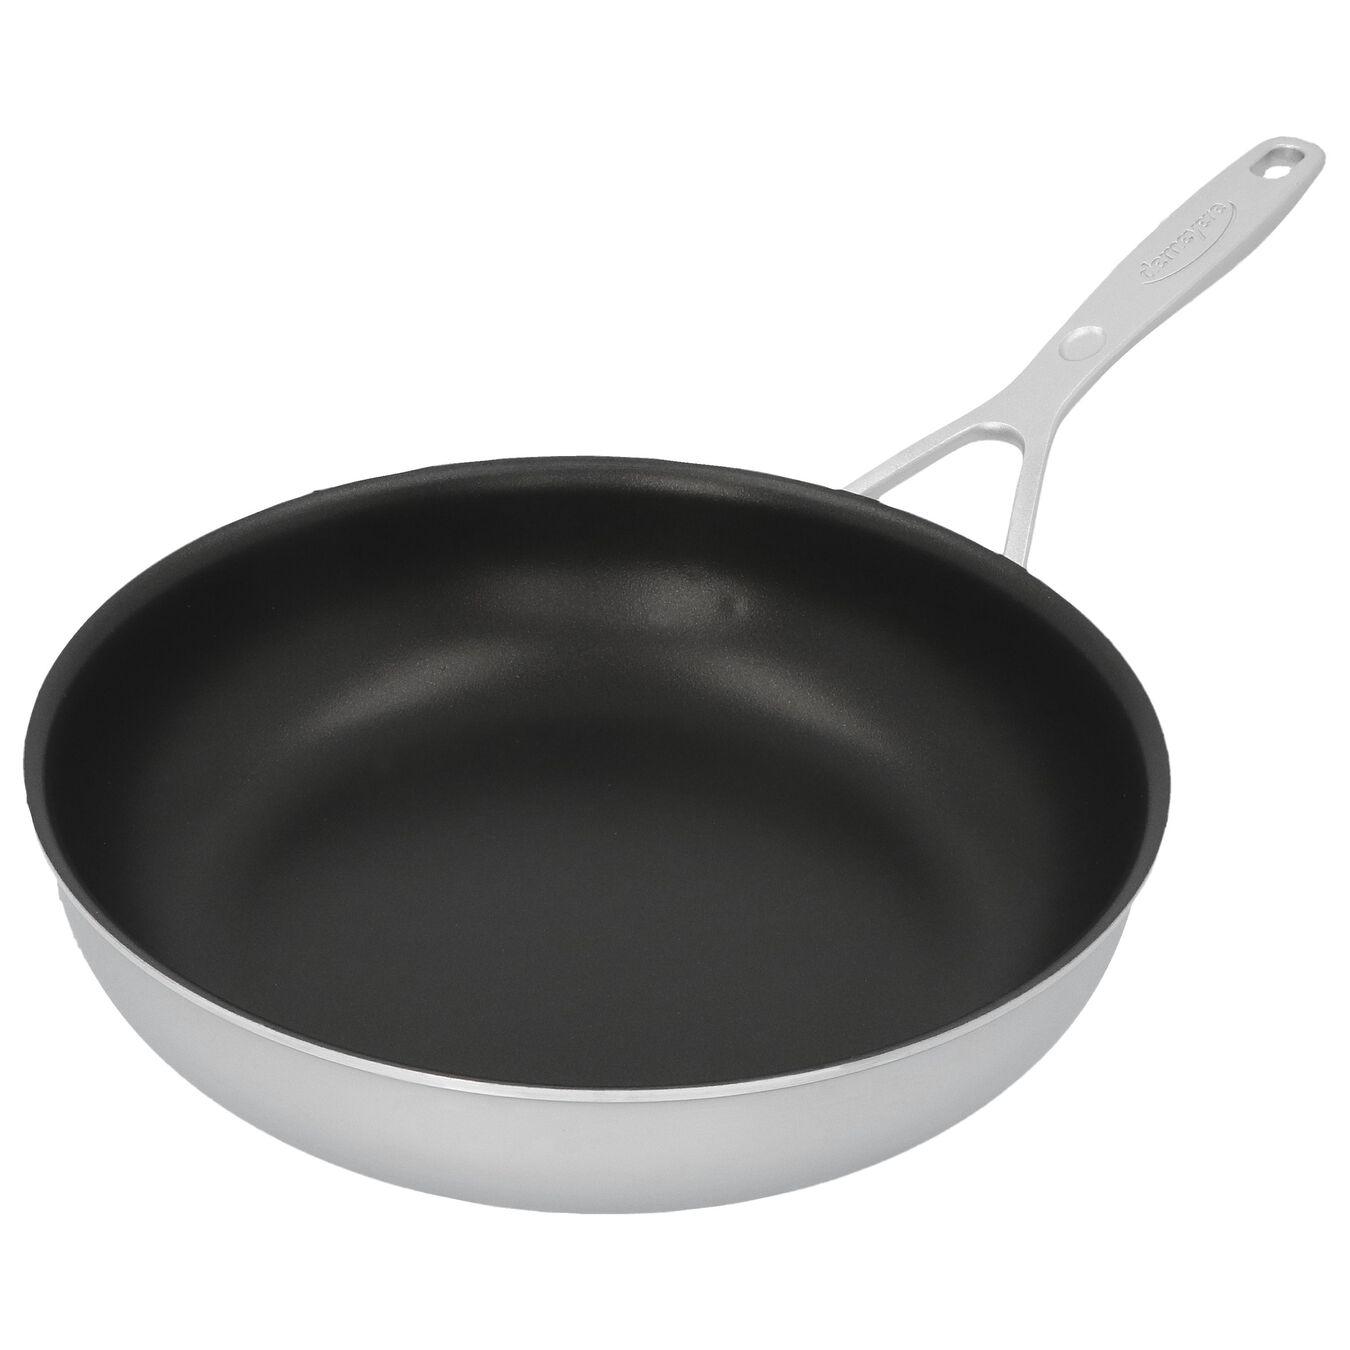 Stekpanna 24 cm, 18/10 Rostfritt stål, Silver-Svart,,large 4